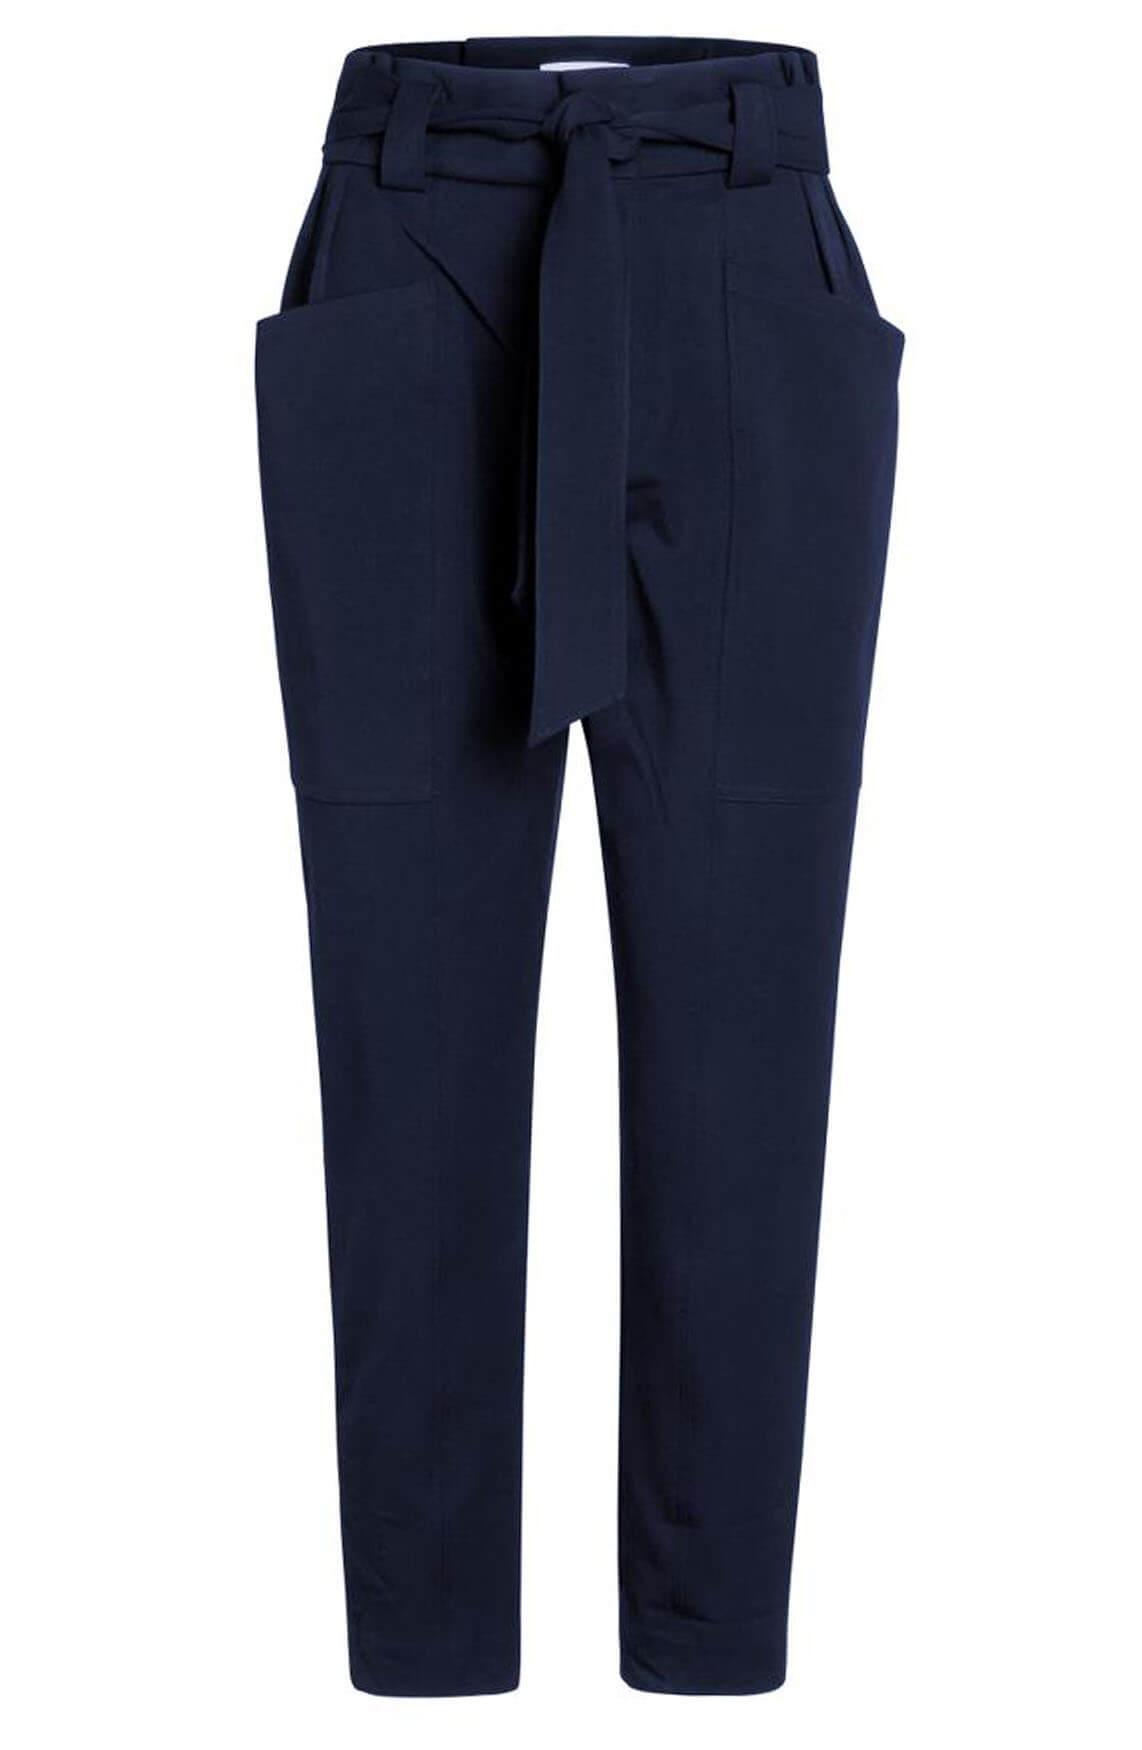 Co Couture Dames Miya Pocket broek Blauw